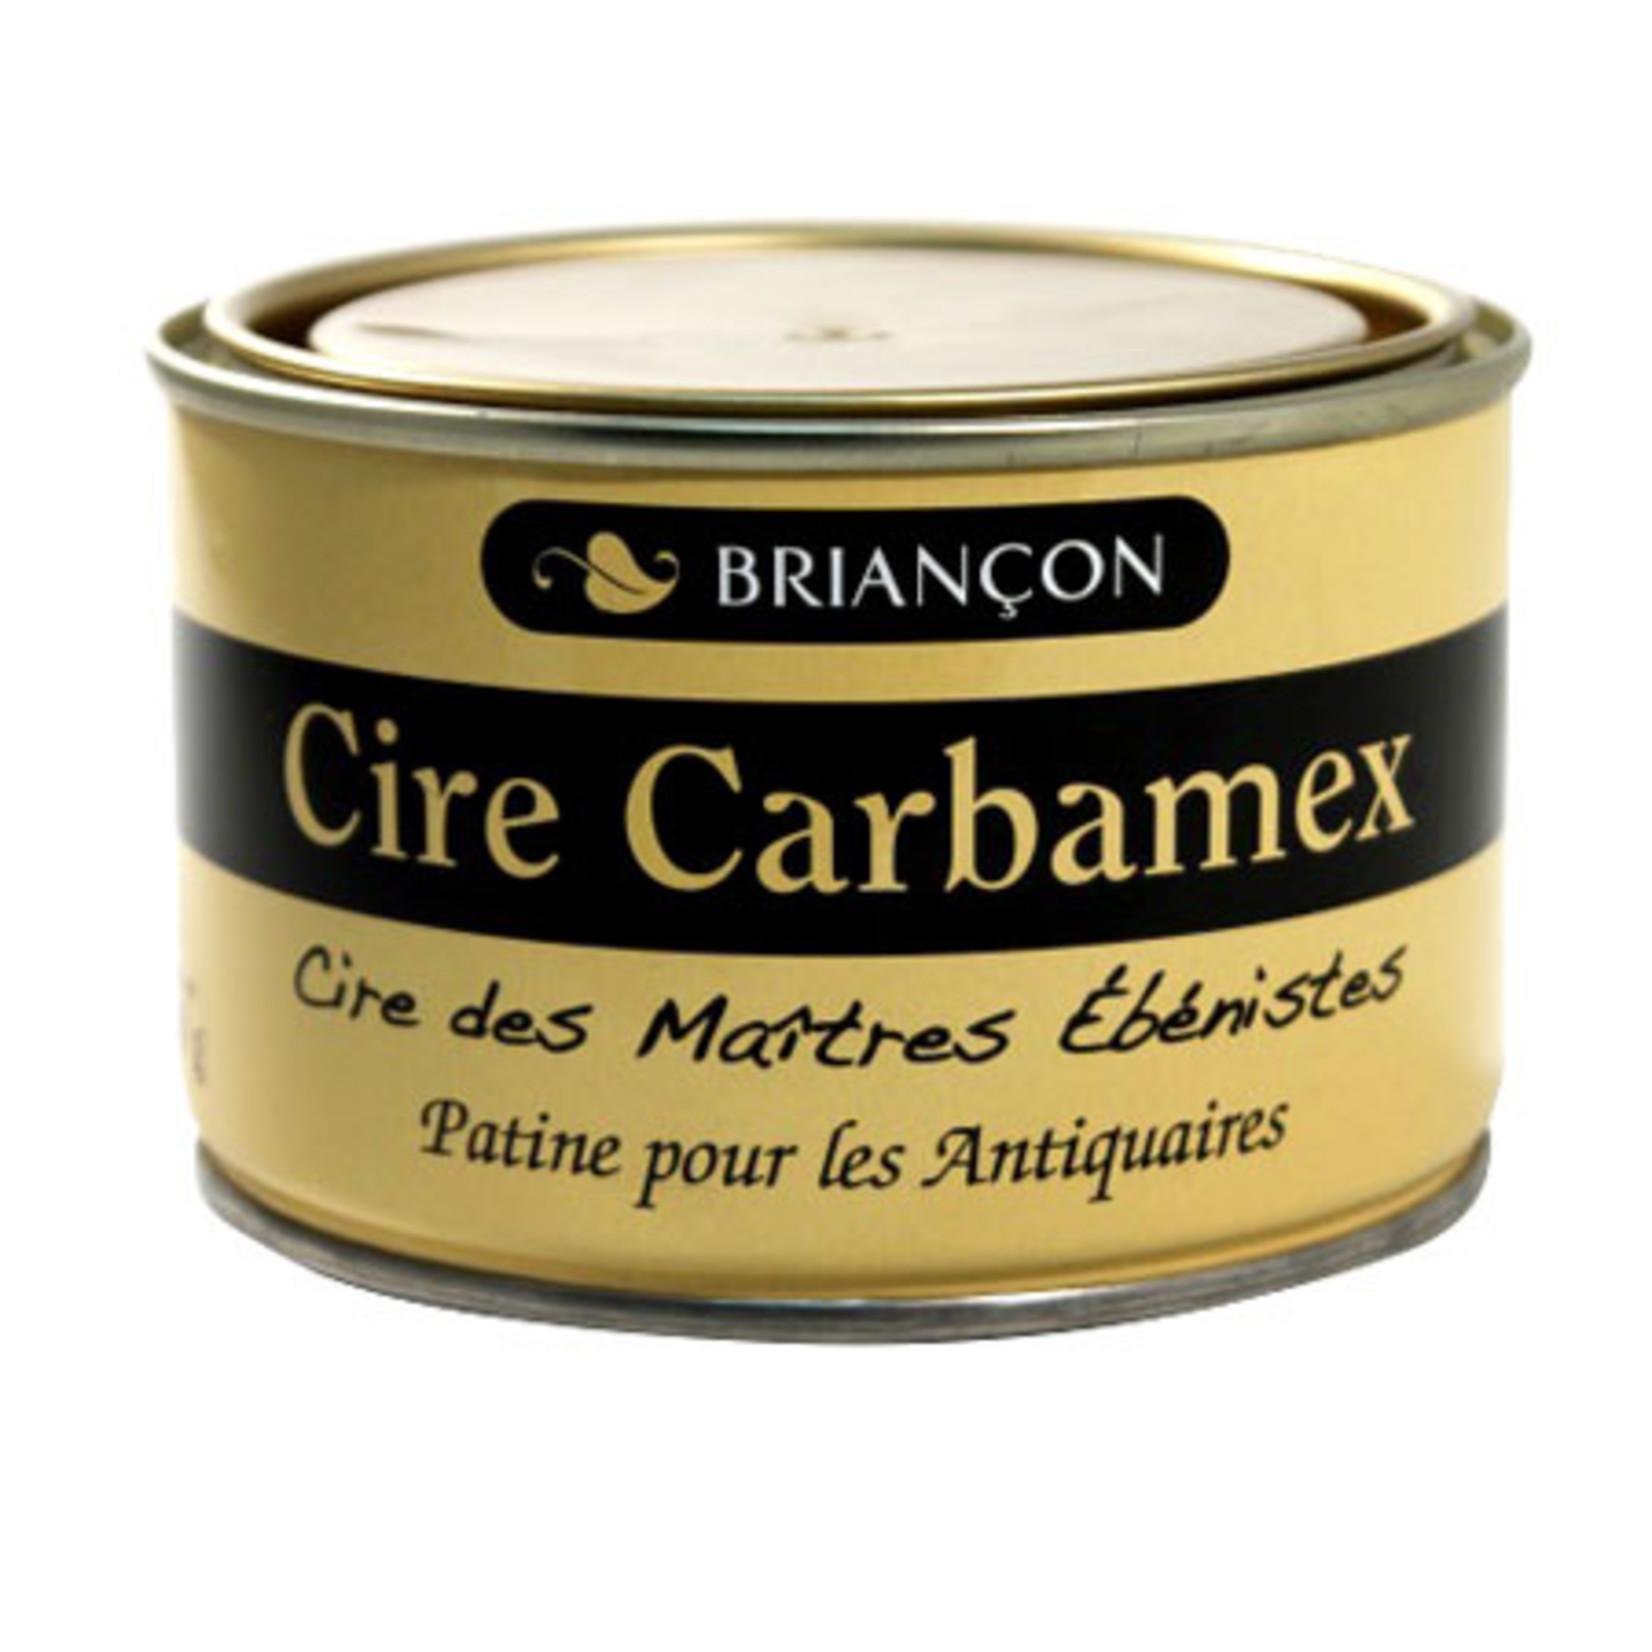 Blanchon Cire Carbamex - Cire en pâte